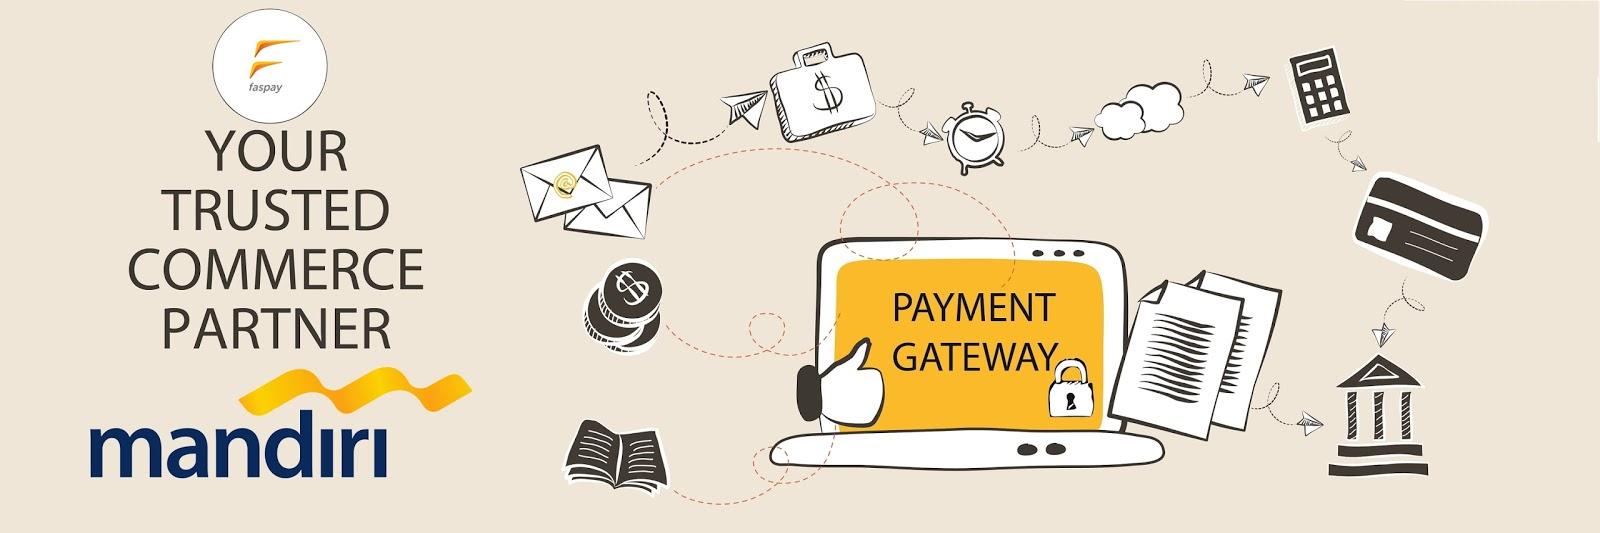 Payment Gateway Faspay